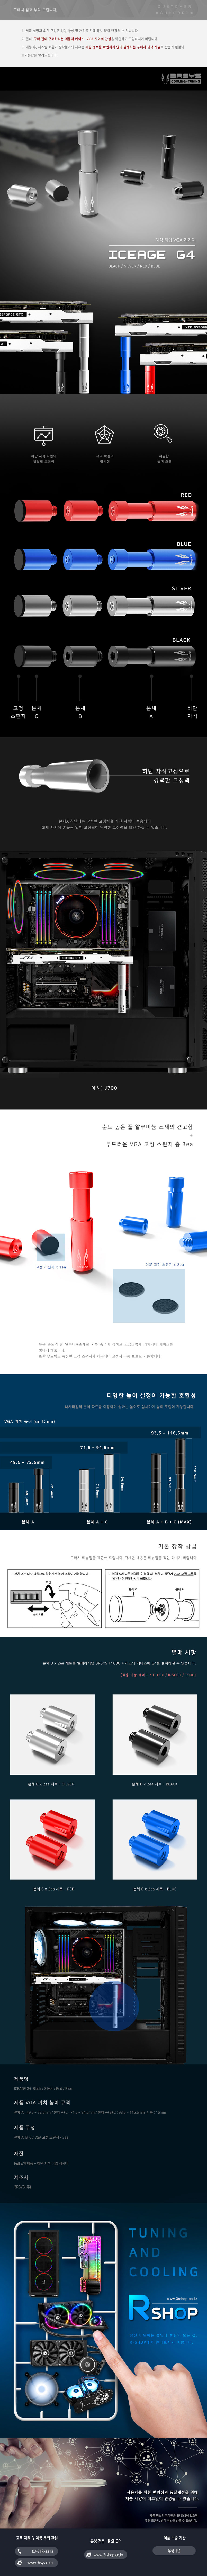 3RSYS  ICEAGE G4 그래픽카드 지지대(BLUE)